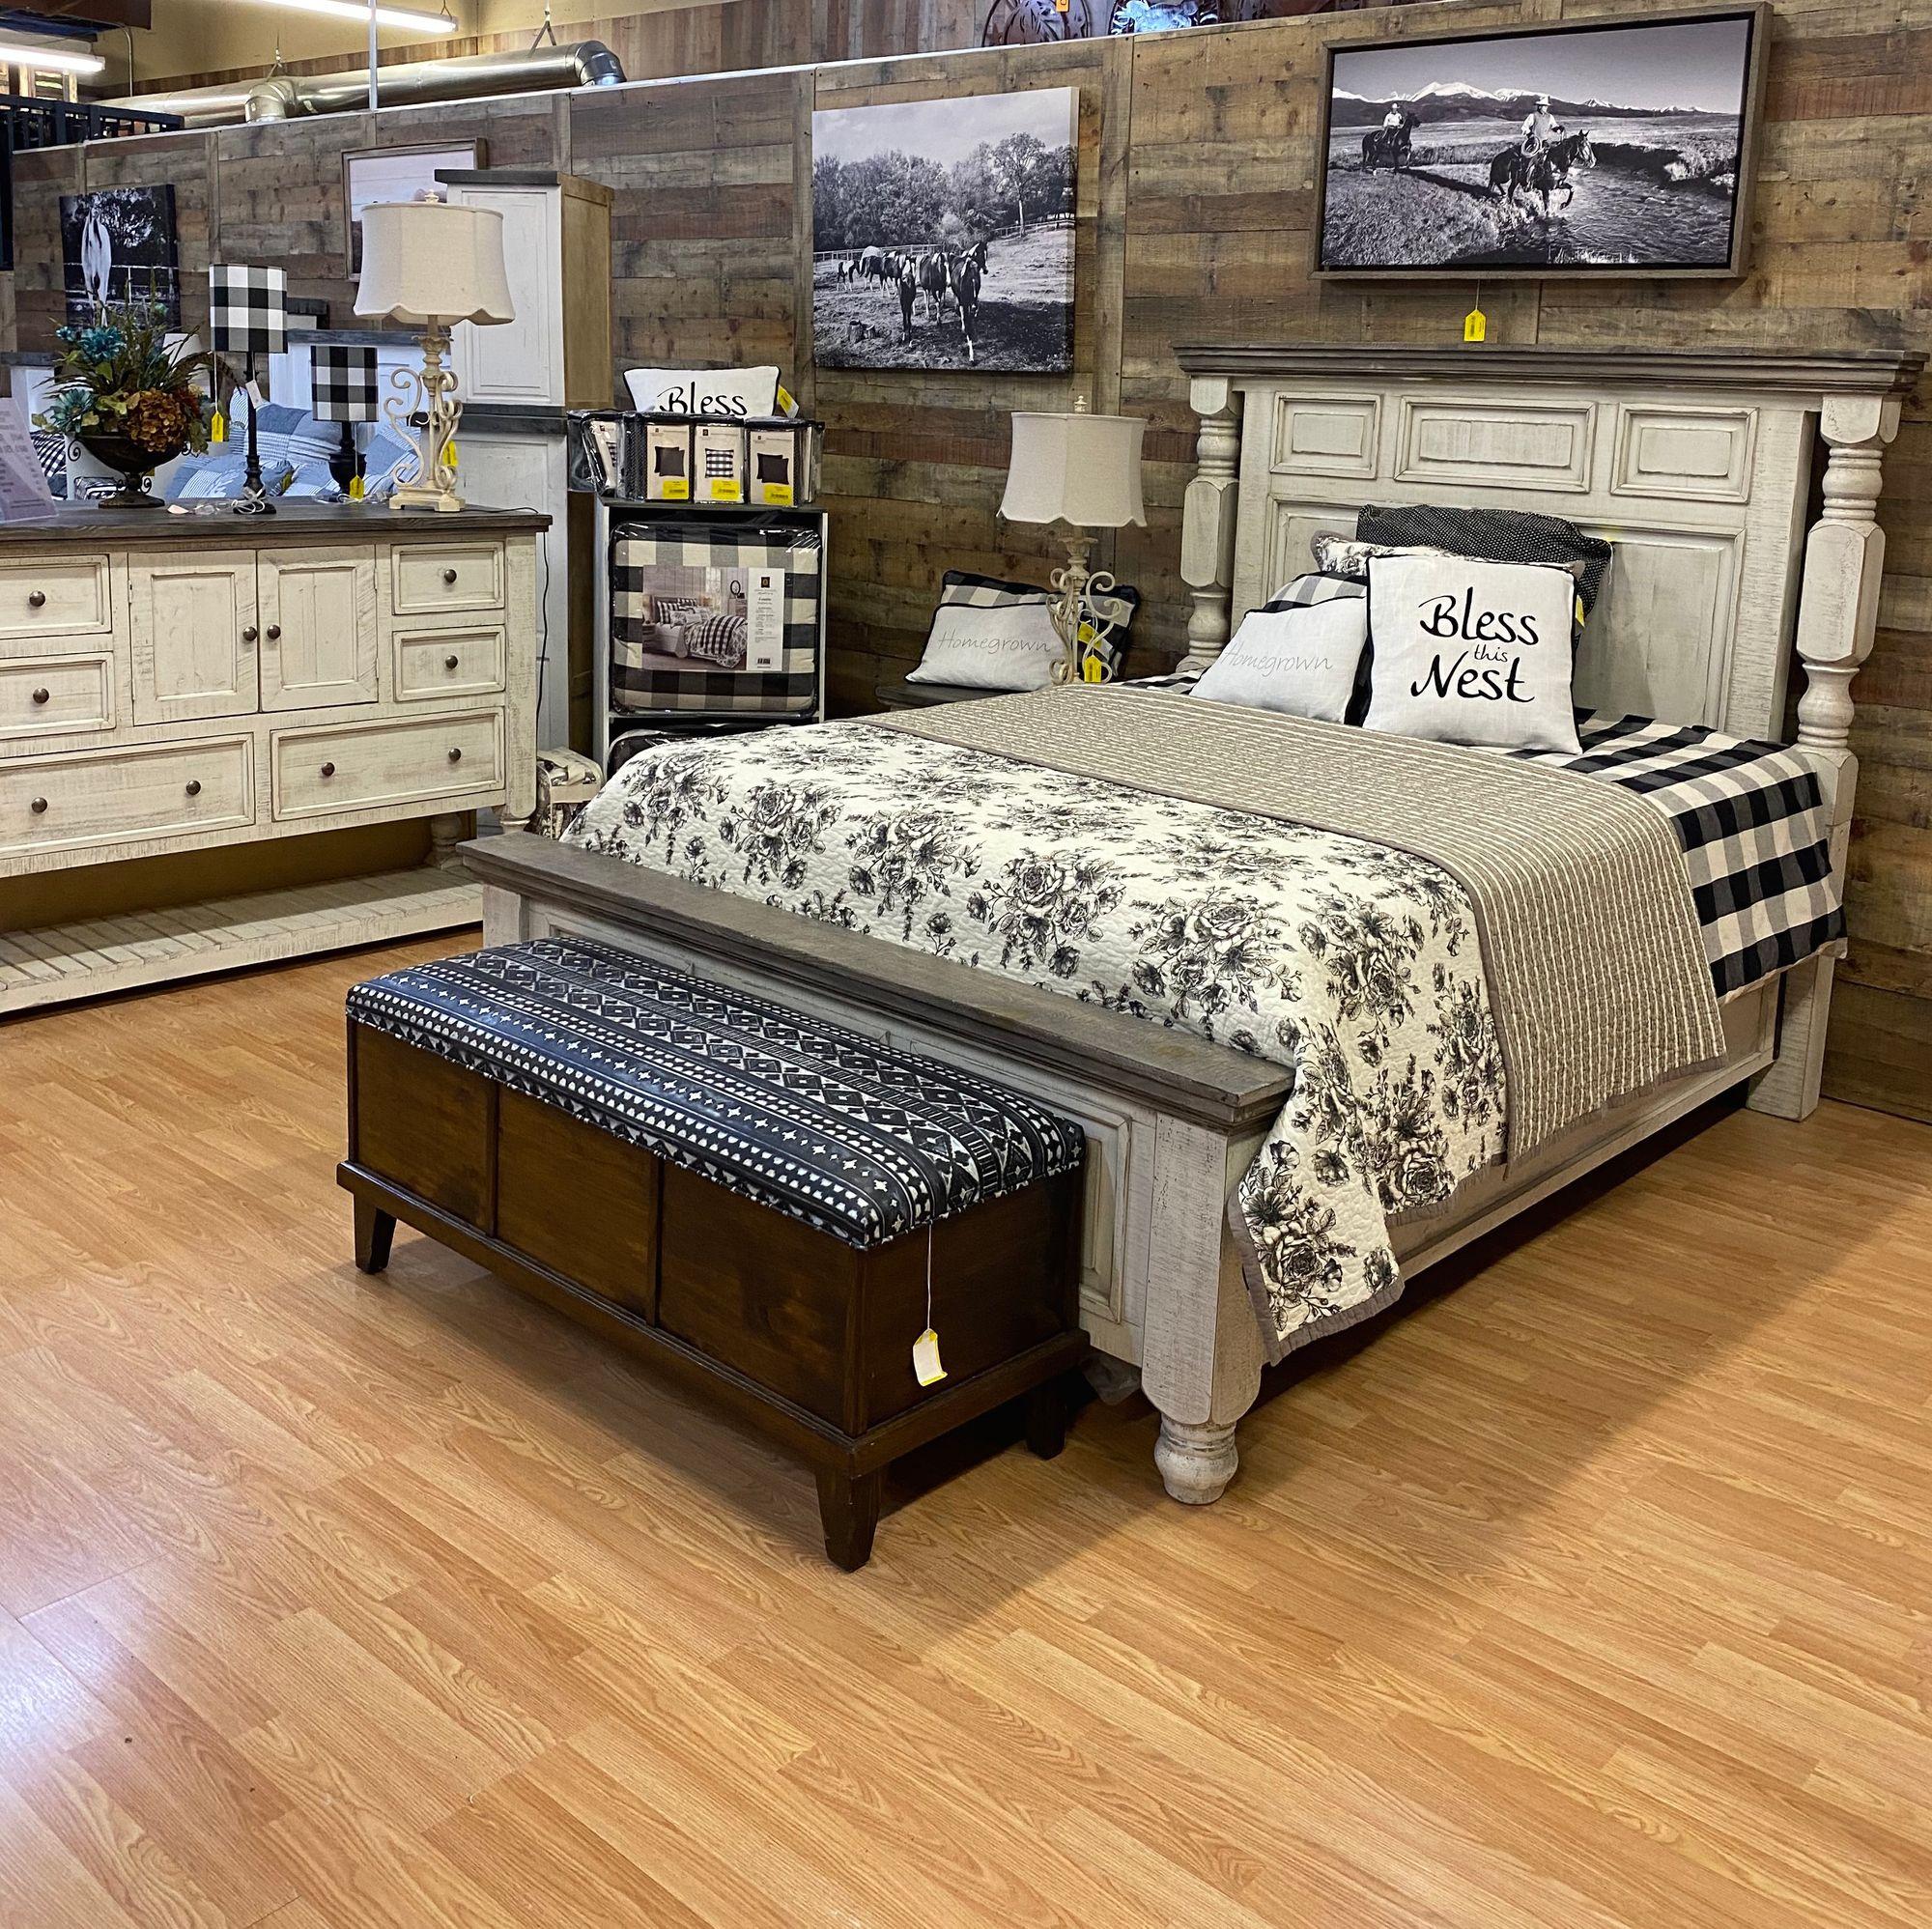 Suburban Farmhouse at Its Best! #rfdepot #suburbanfarmhouse #bedroomfurniture #bedroom #bedroominspiration #bedroomset #homedecor #farmhousedecor #labordaysale